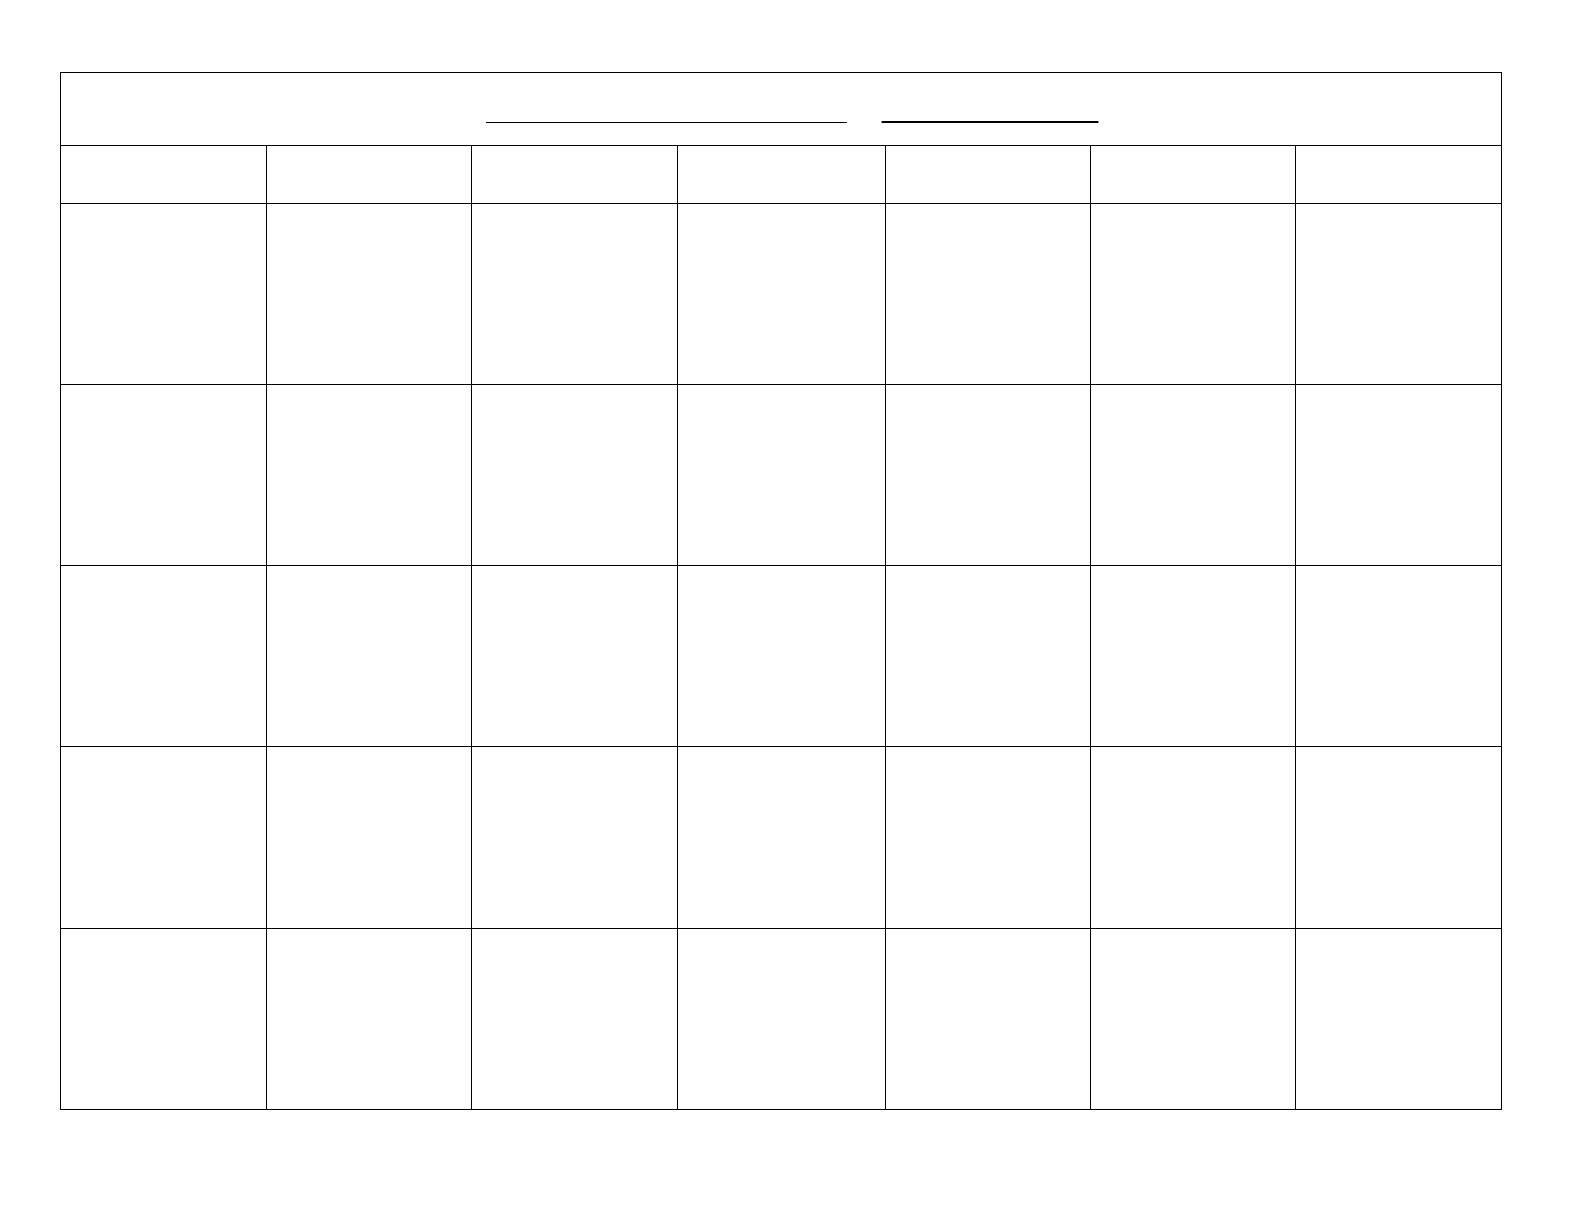 Handwriting Calendar  30 Day  Monday Free Download regarding Free Printable Monday Through Friday Calendar